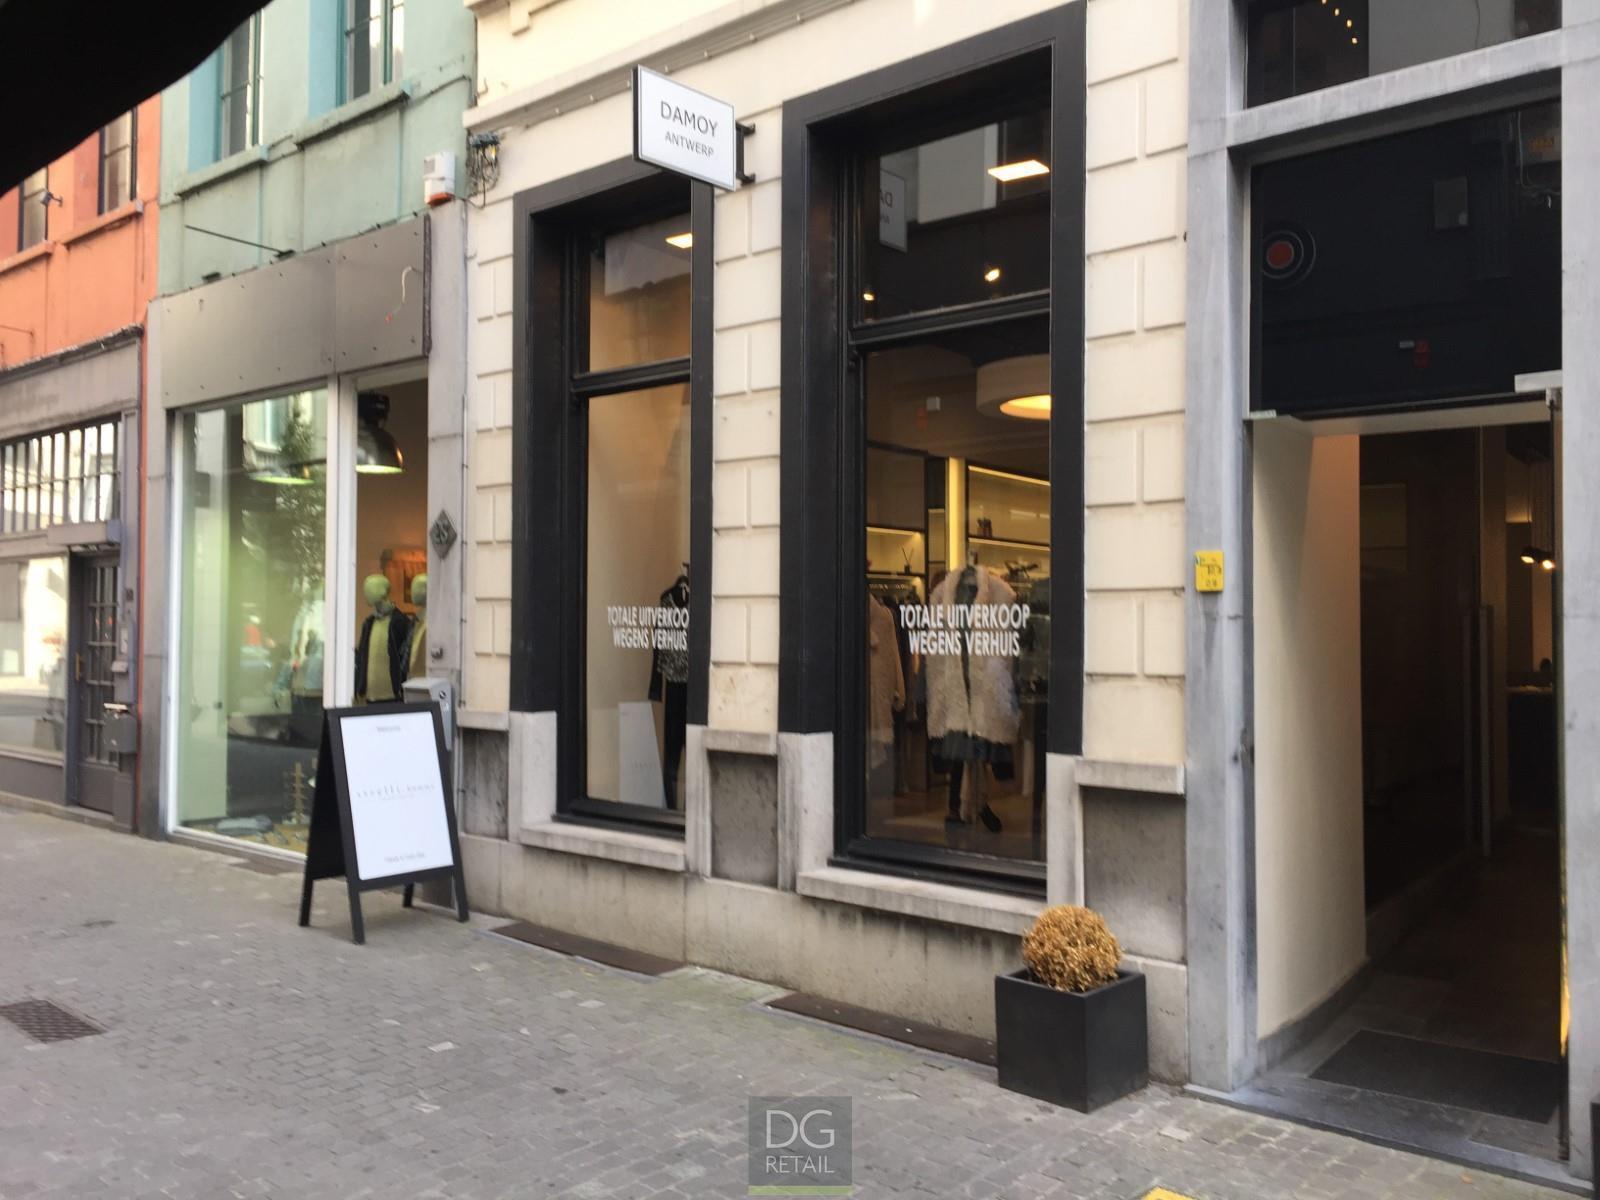 winkelpand te huur R1288 - Groendalstraat 24, 2000 Antwerpen, België 1